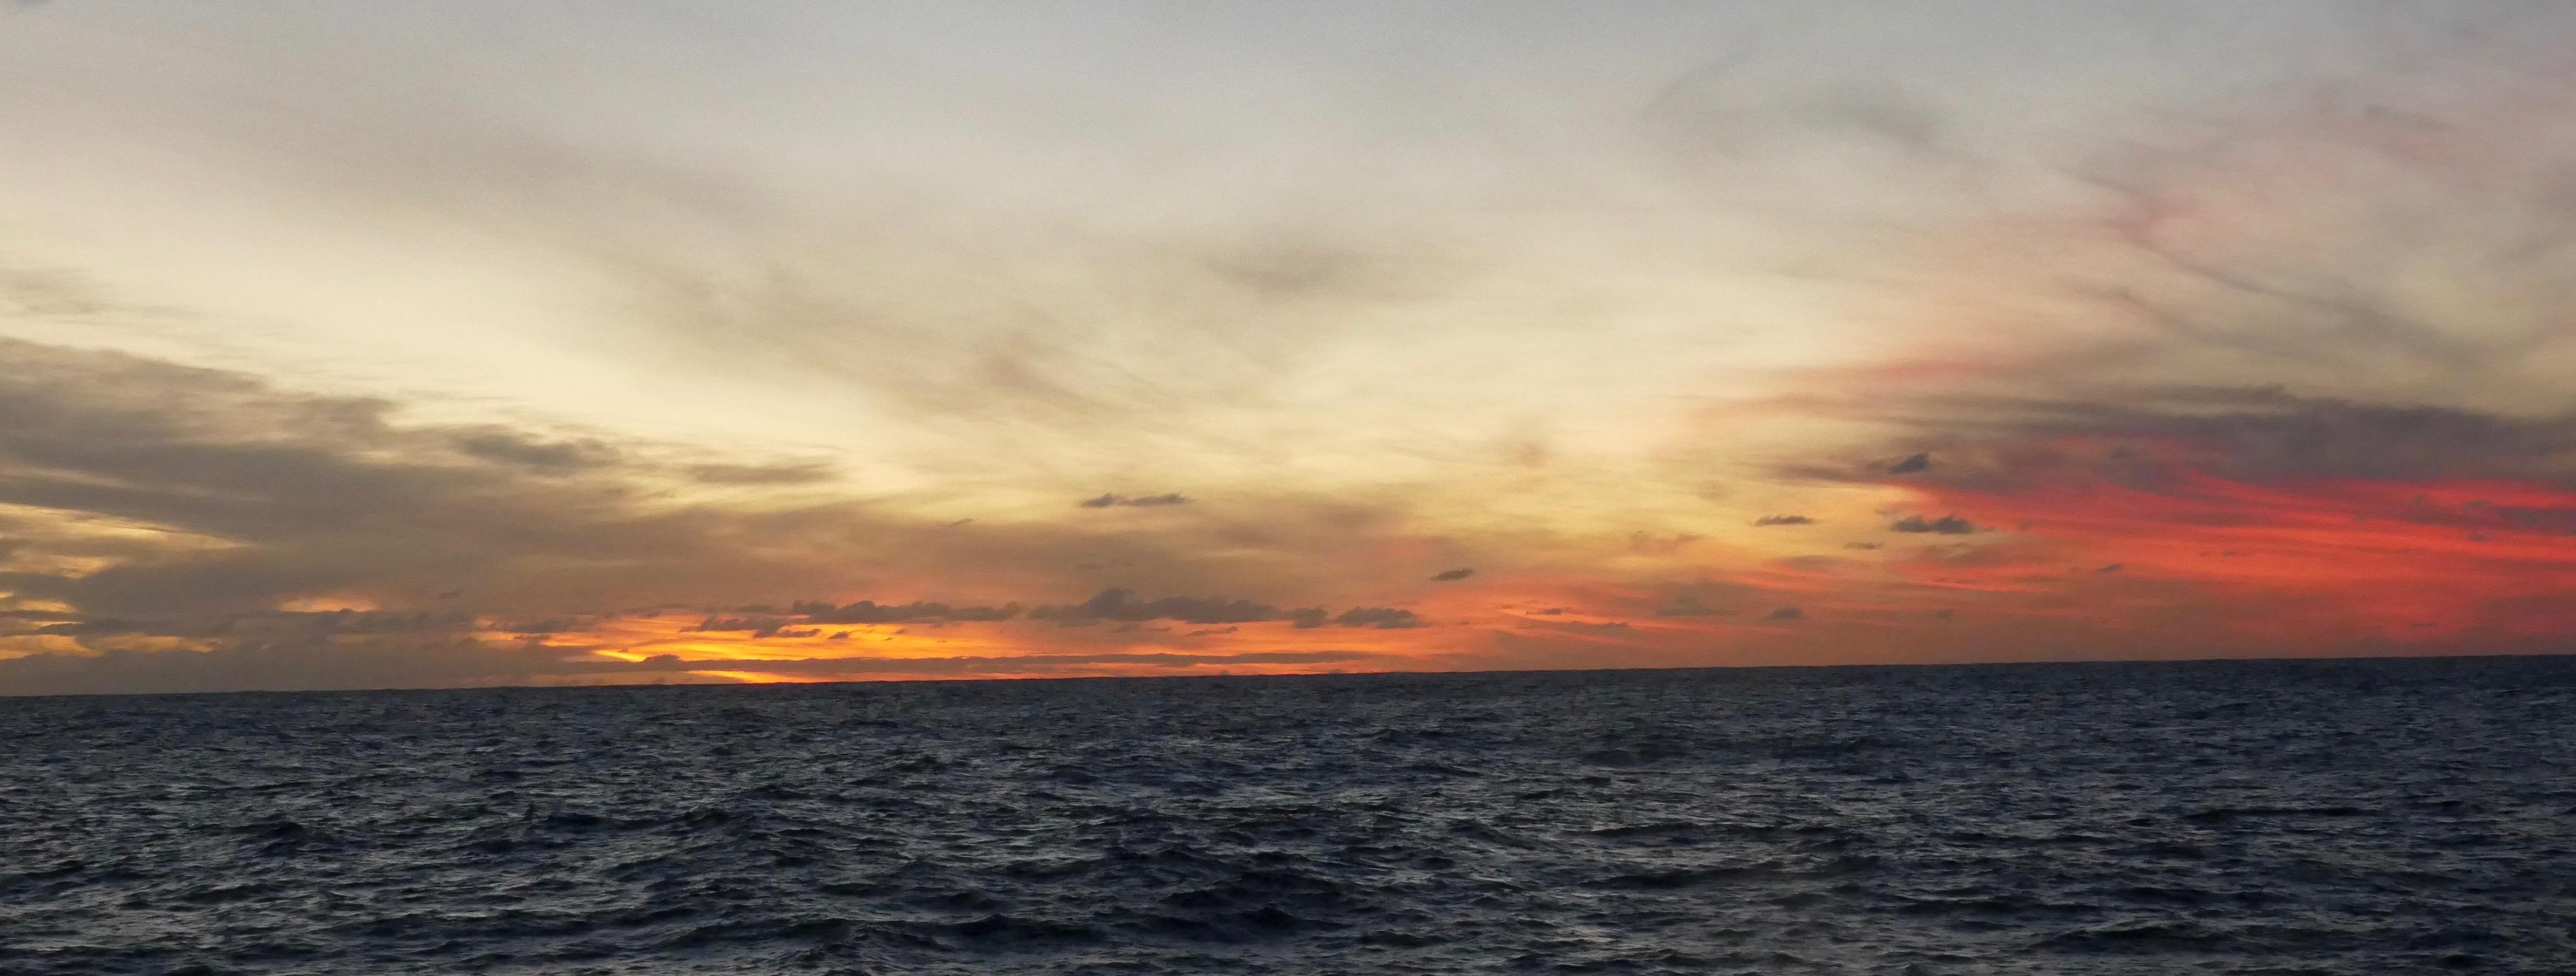 sunset, storm, south Atlantic